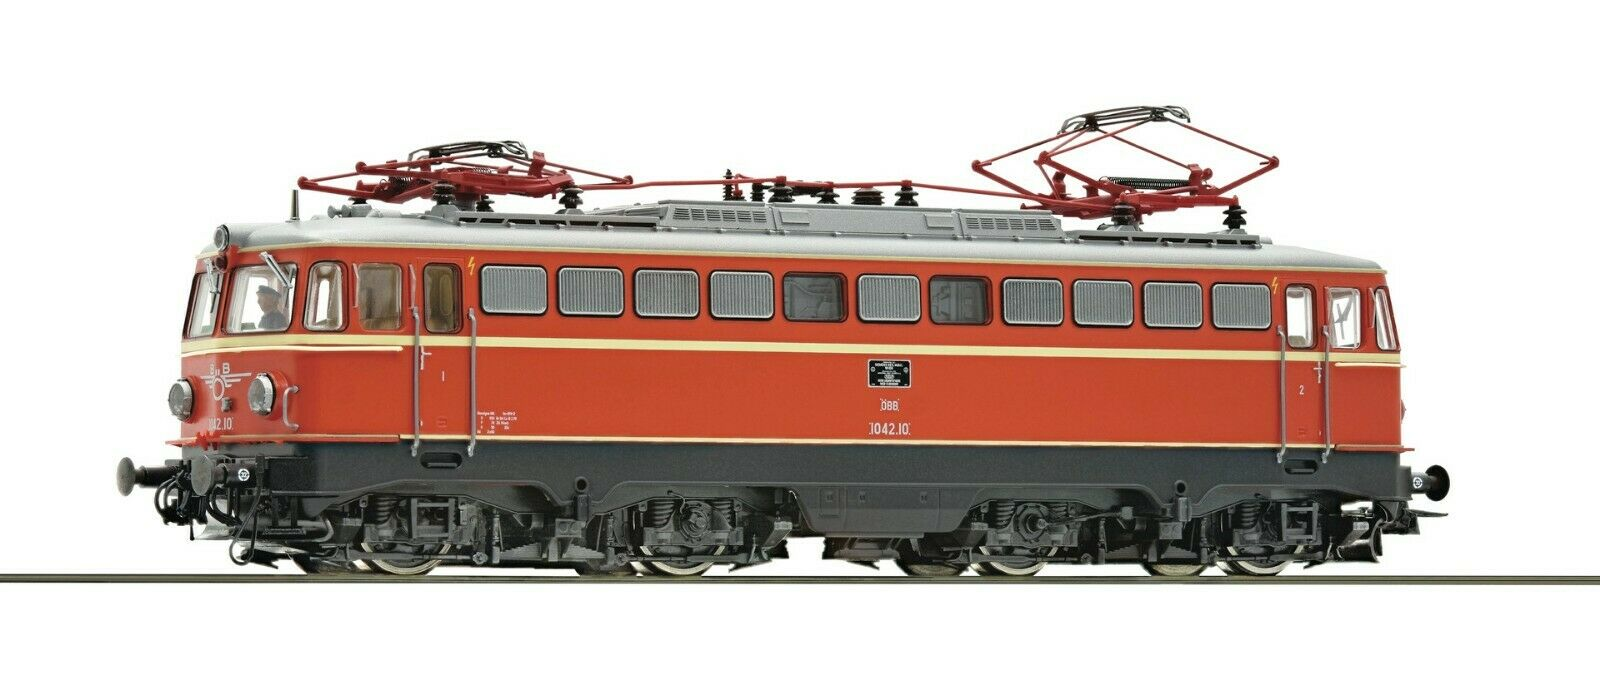 Roco HO scale Electric locomotive 1042.10 OBB